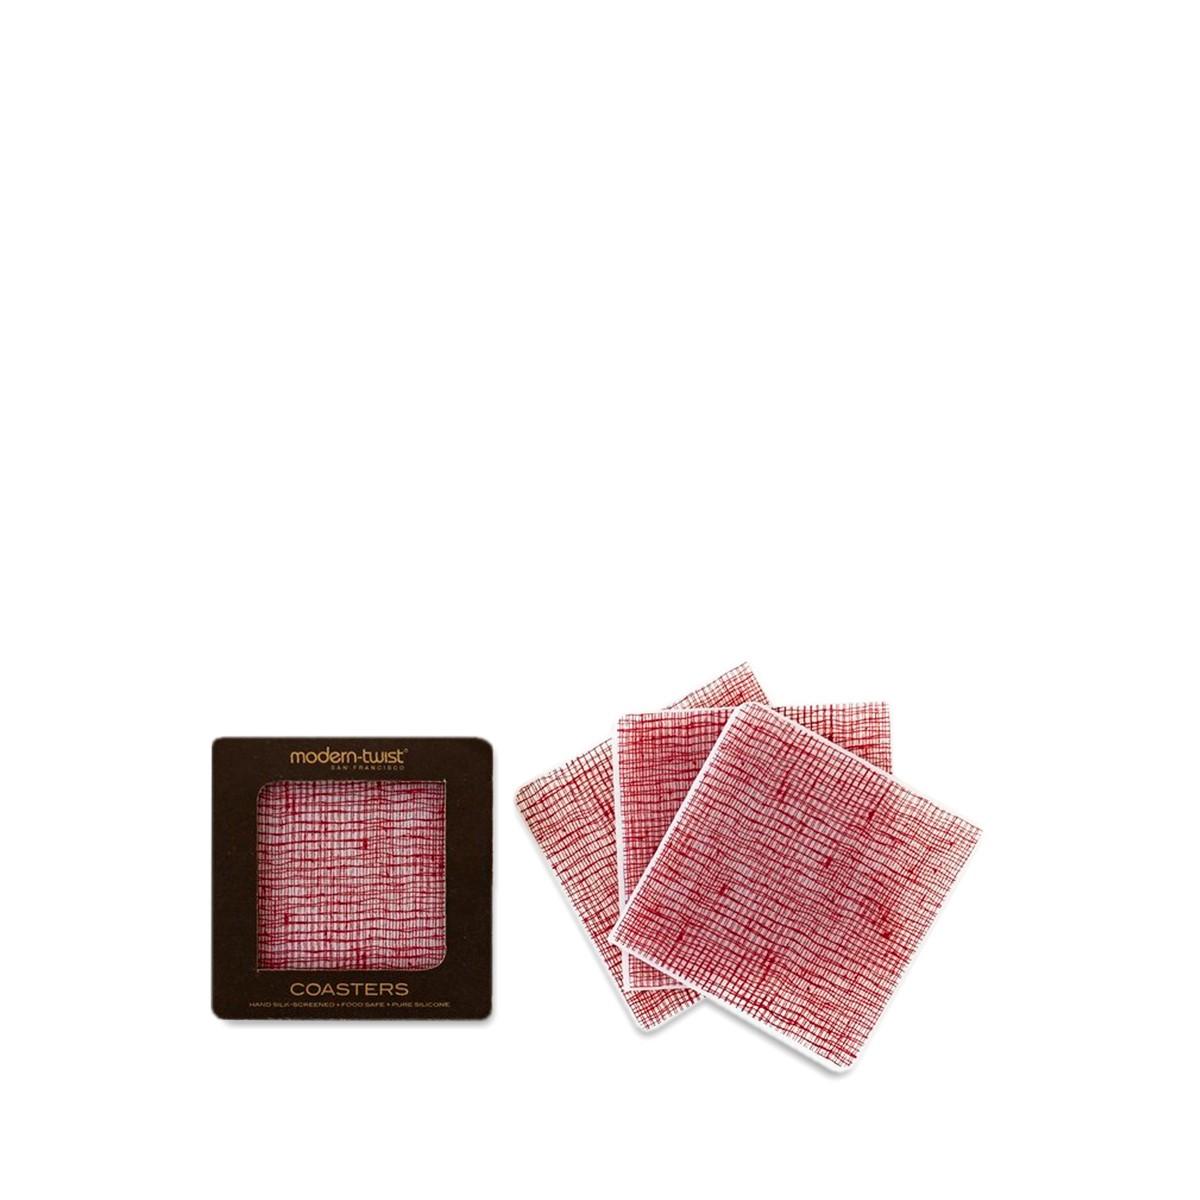 Cranberry Linen Coasters By Modern Twist Thrive Market